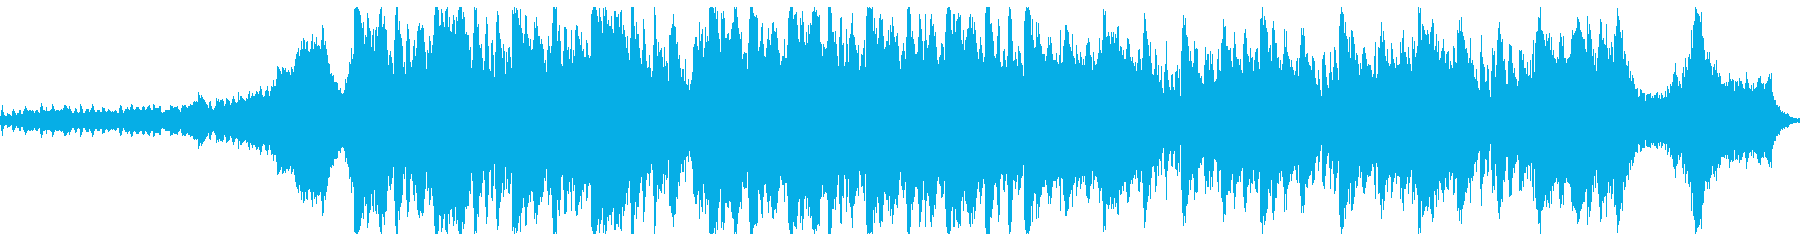 Orchestral-Action...の再生済みの波形